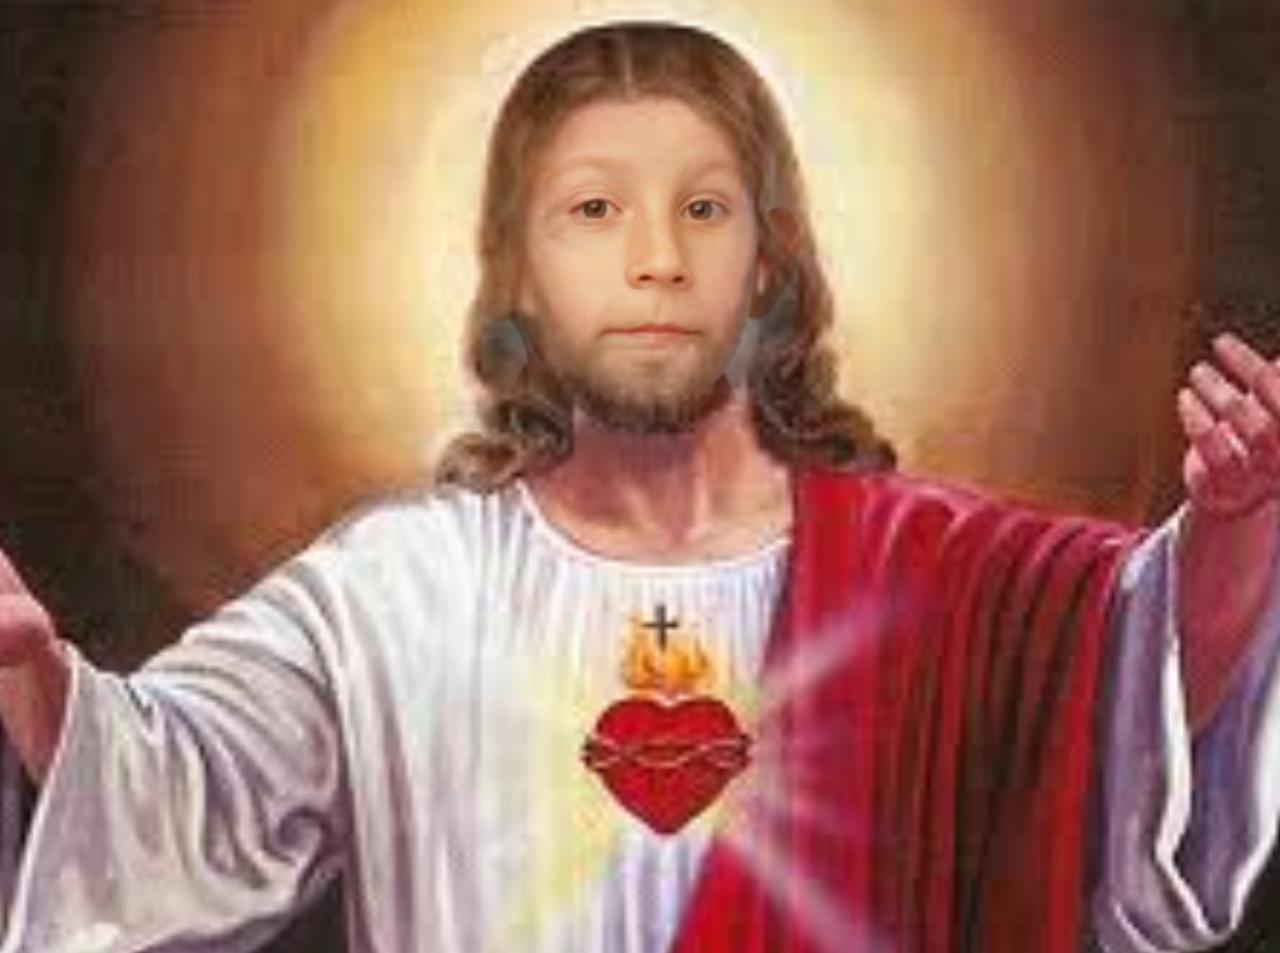 Sticker other raid twitter rip dewey jesus christ saint douille douhi doowap